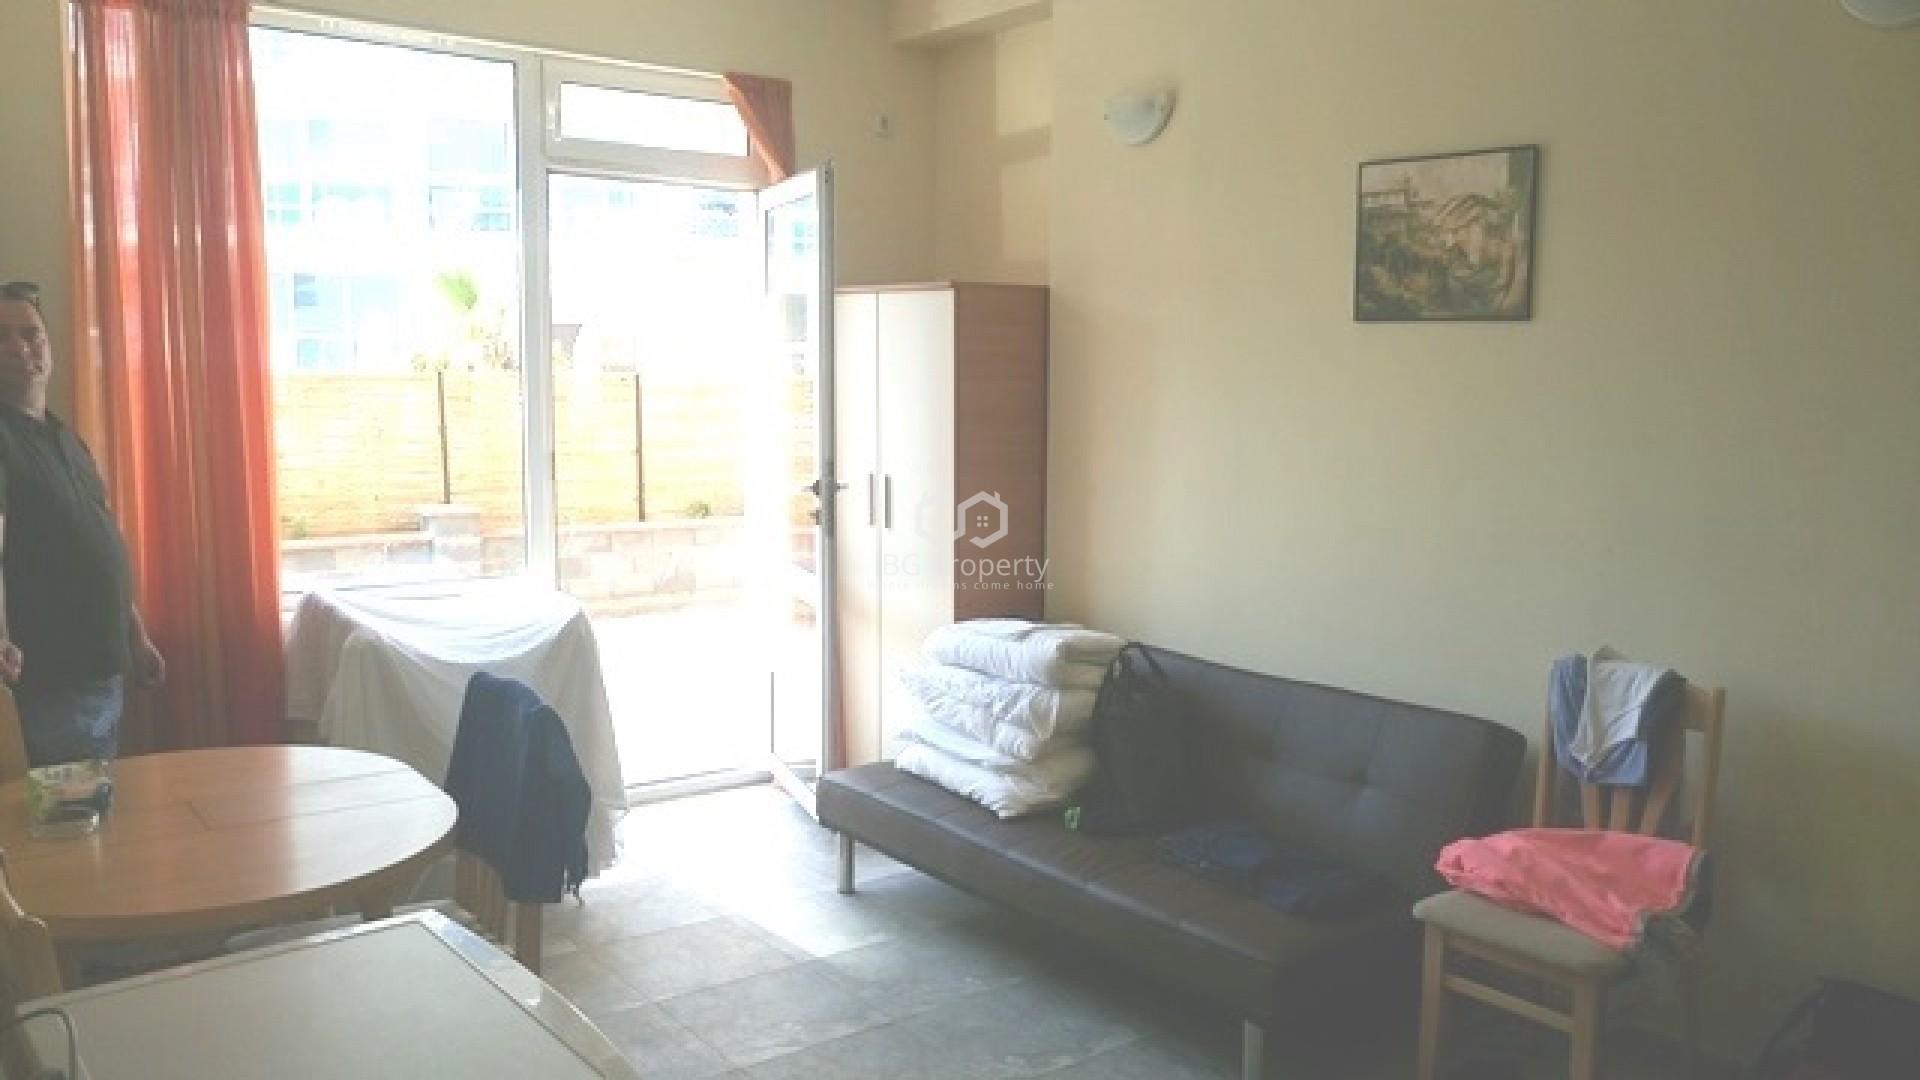 Eдностаен апартамент Слънчев Бряг 41 m2